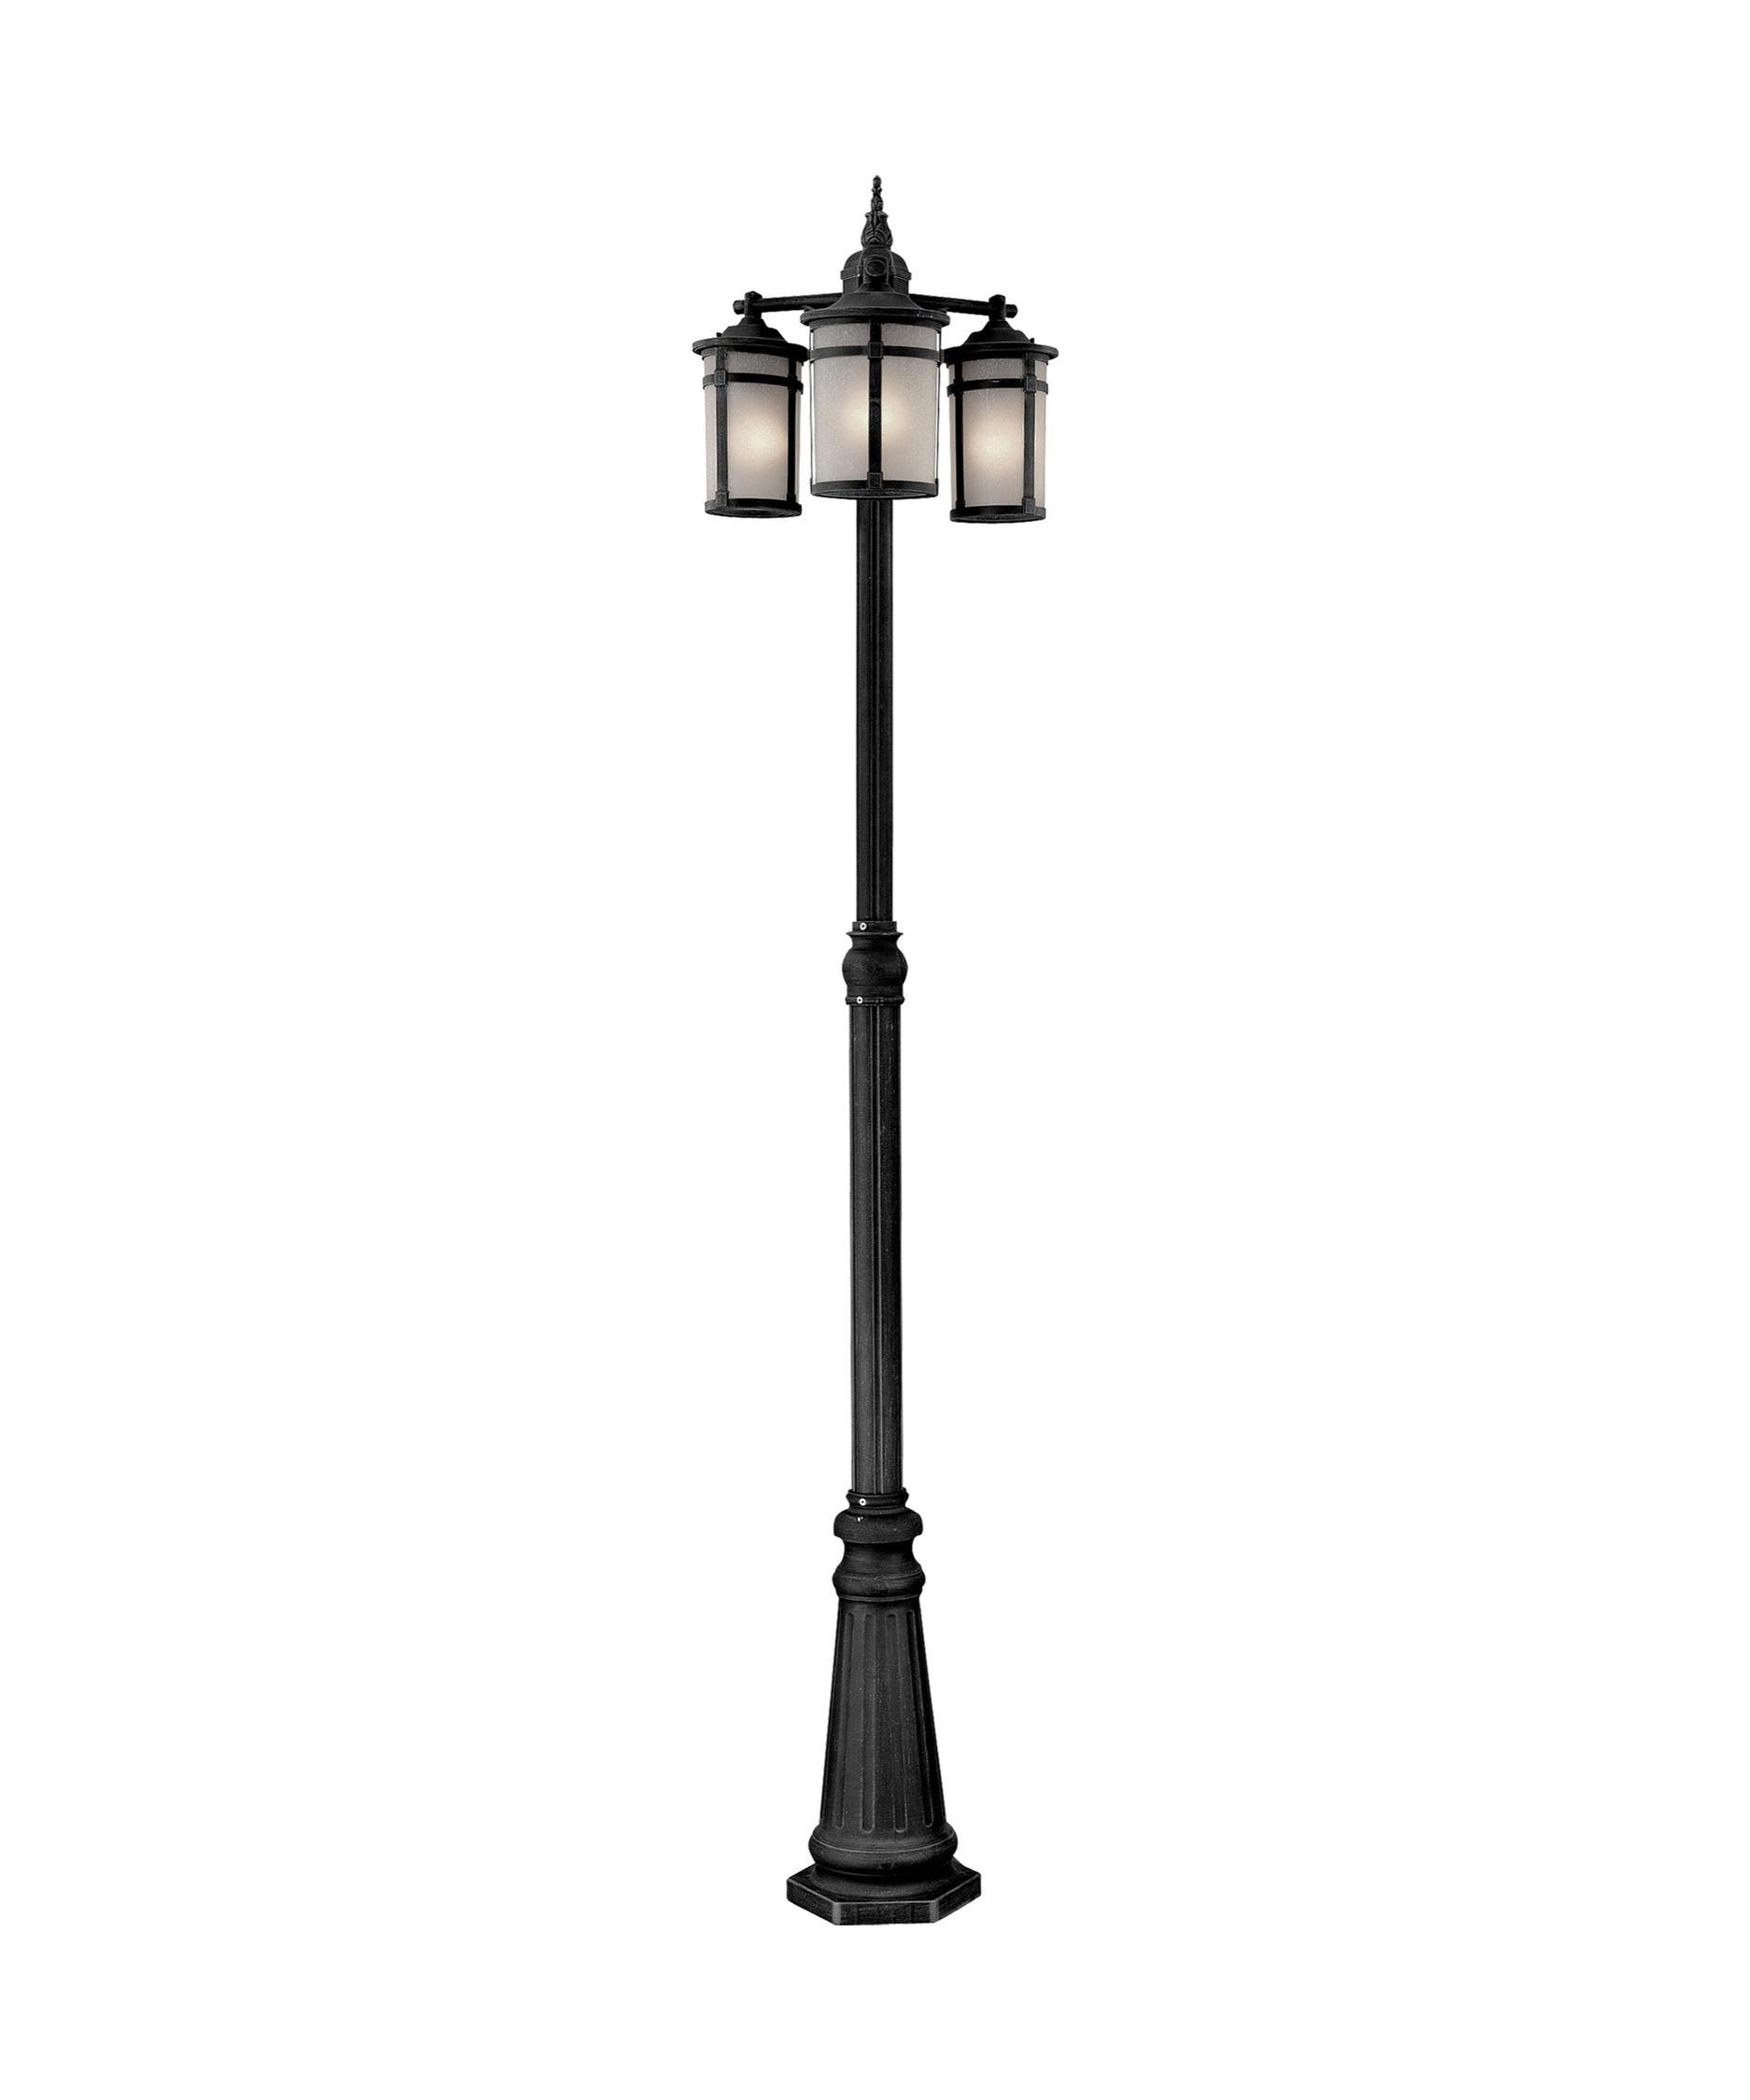 moritz 3 light outdoor post lamp capitol lighting 1. Black Bedroom Furniture Sets. Home Design Ideas